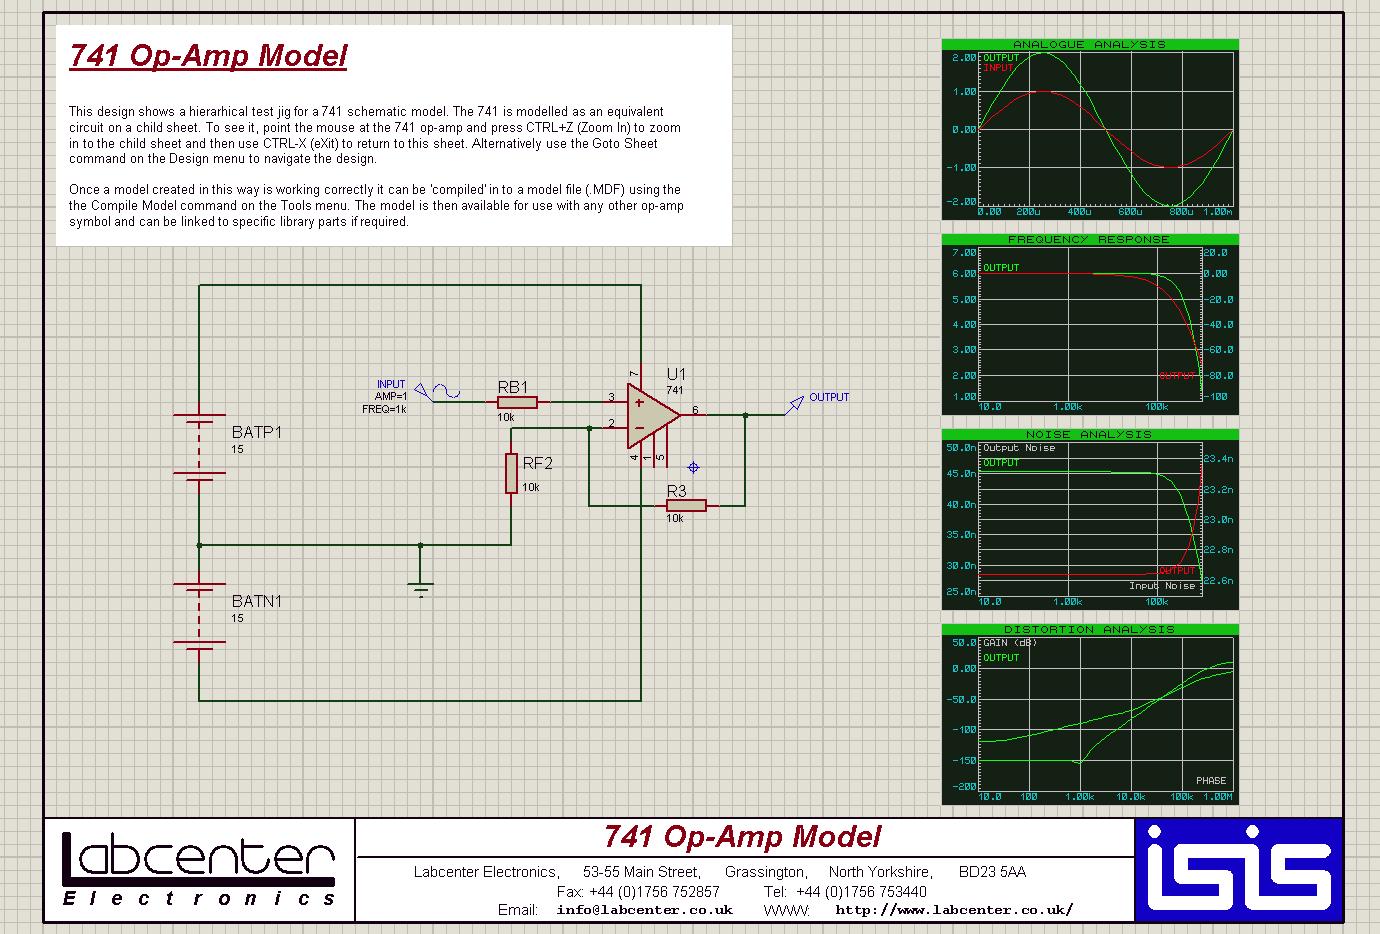 proteus-labcenter-electronics